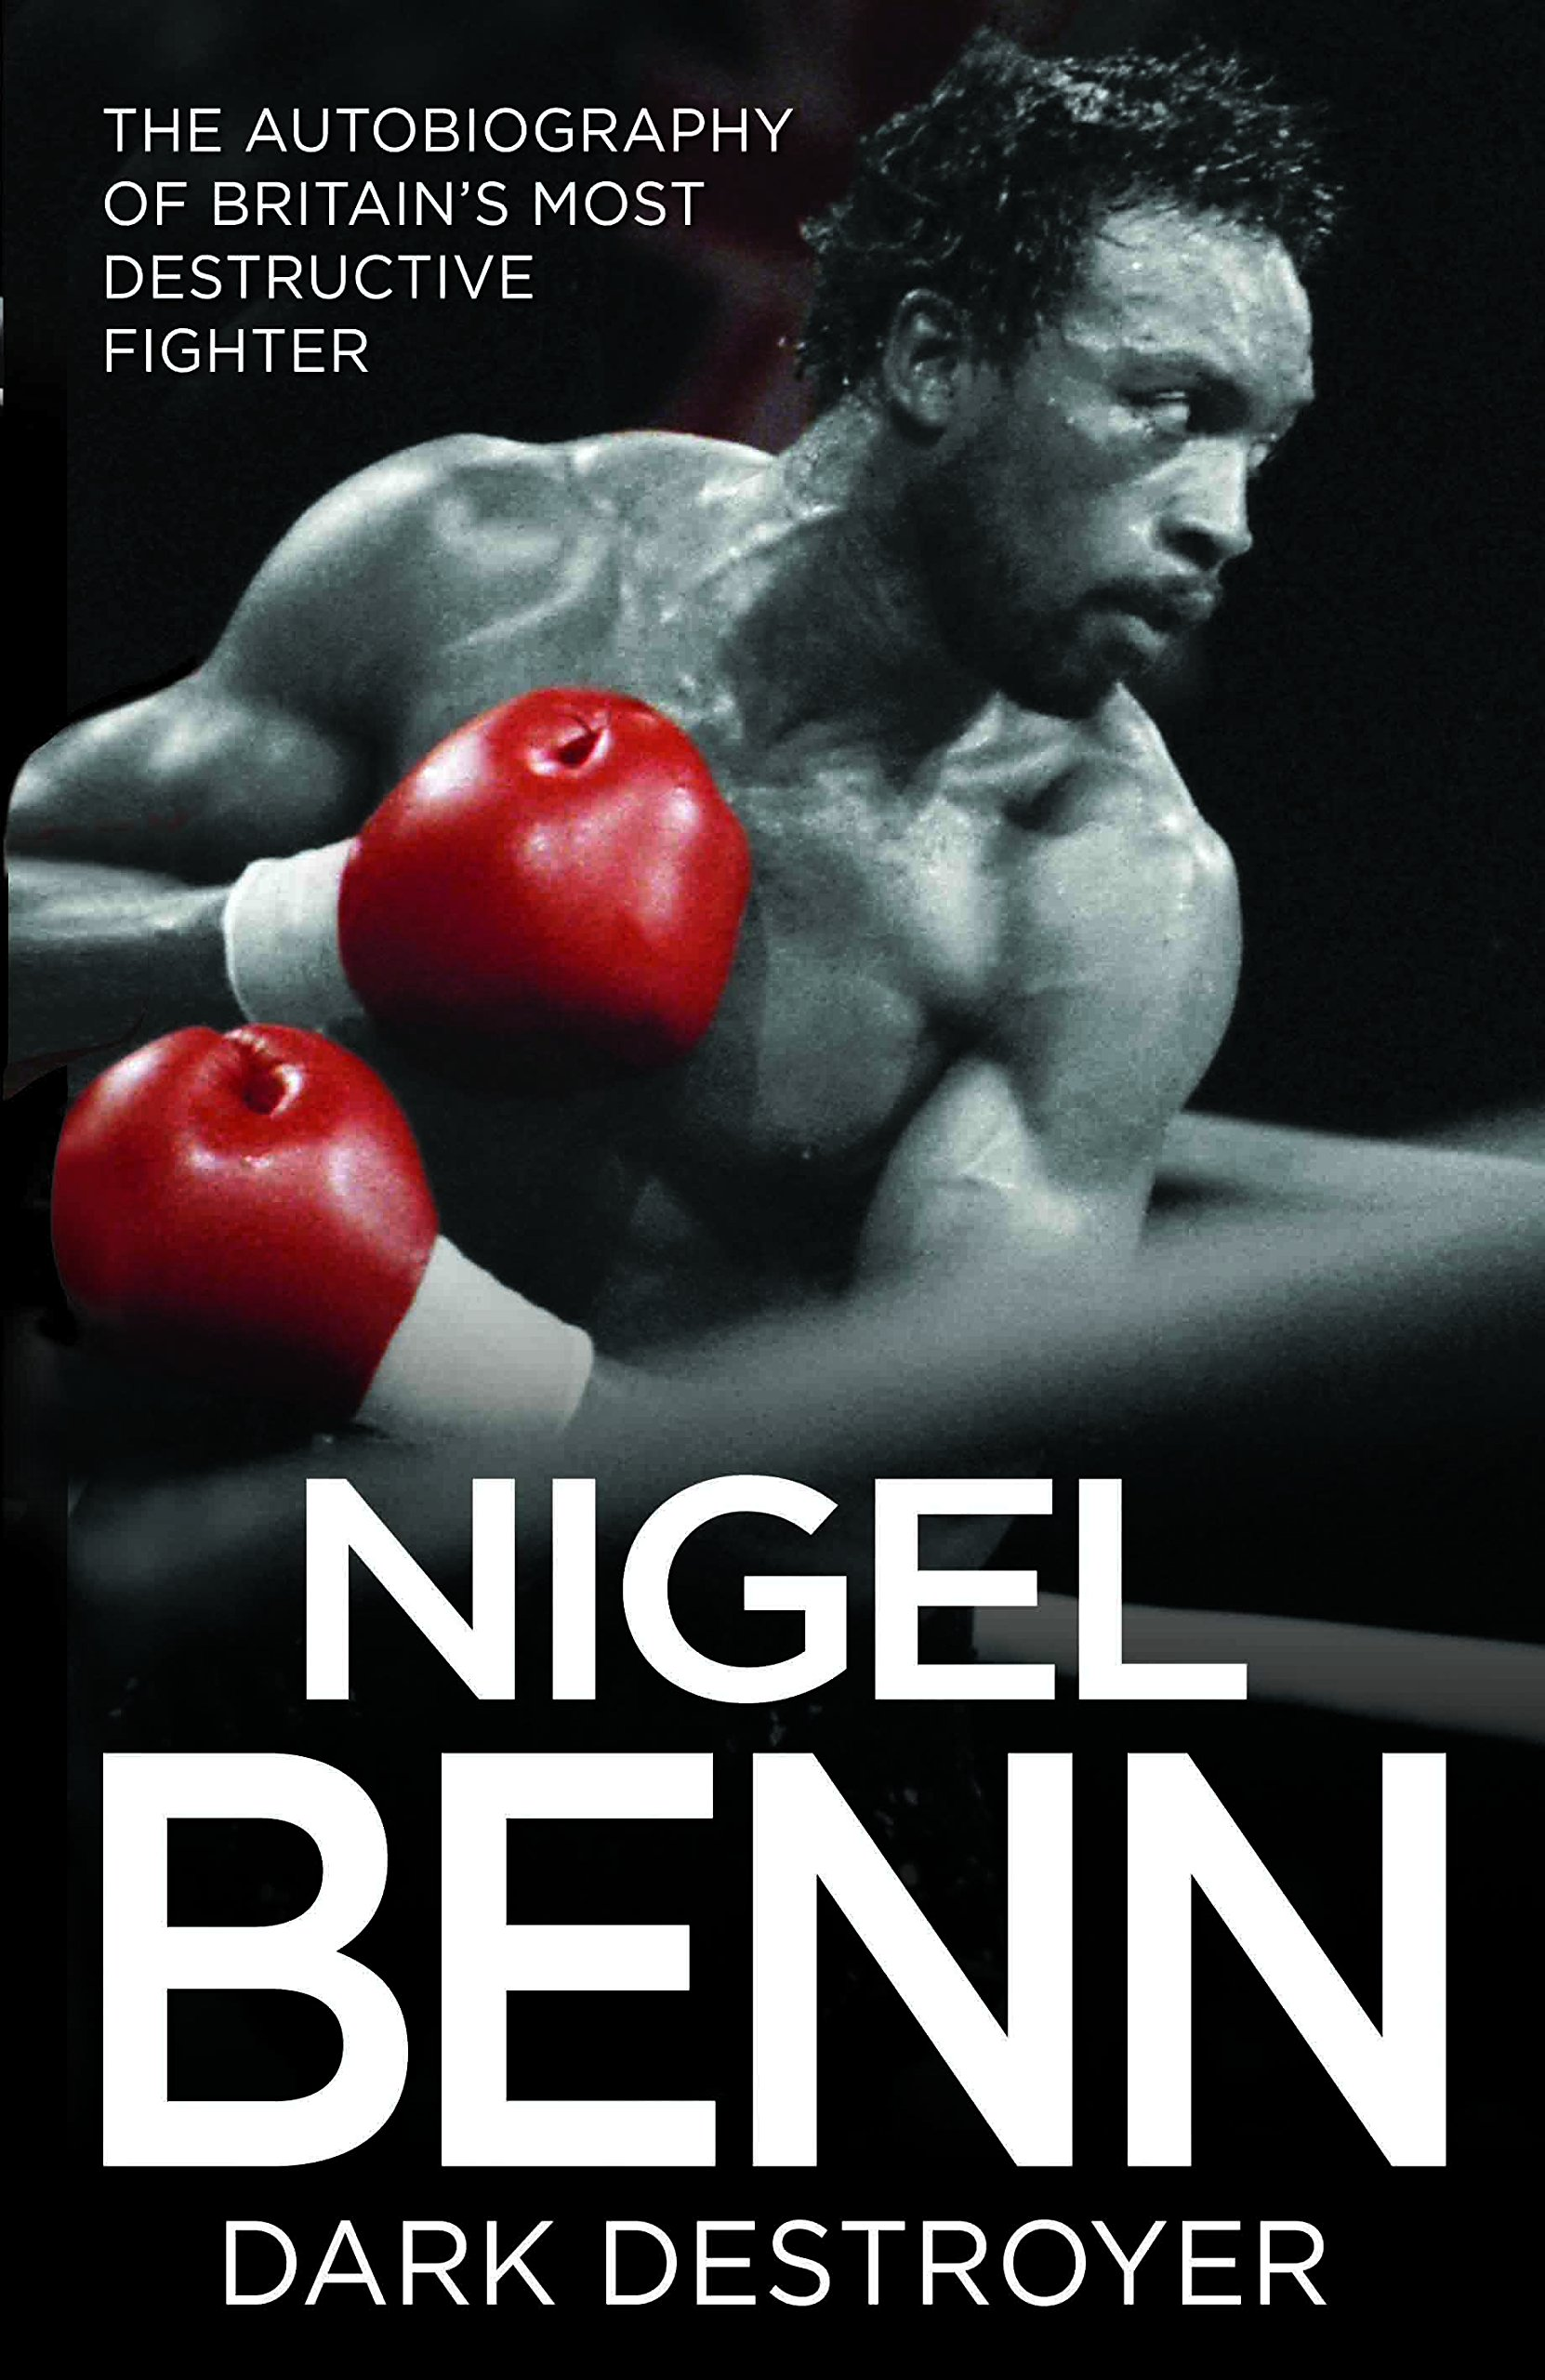 Amazon.com: Nigel Benn: The Dark Destroyer - My Autobiography  (9781786062628): Benn, Nigel: Books